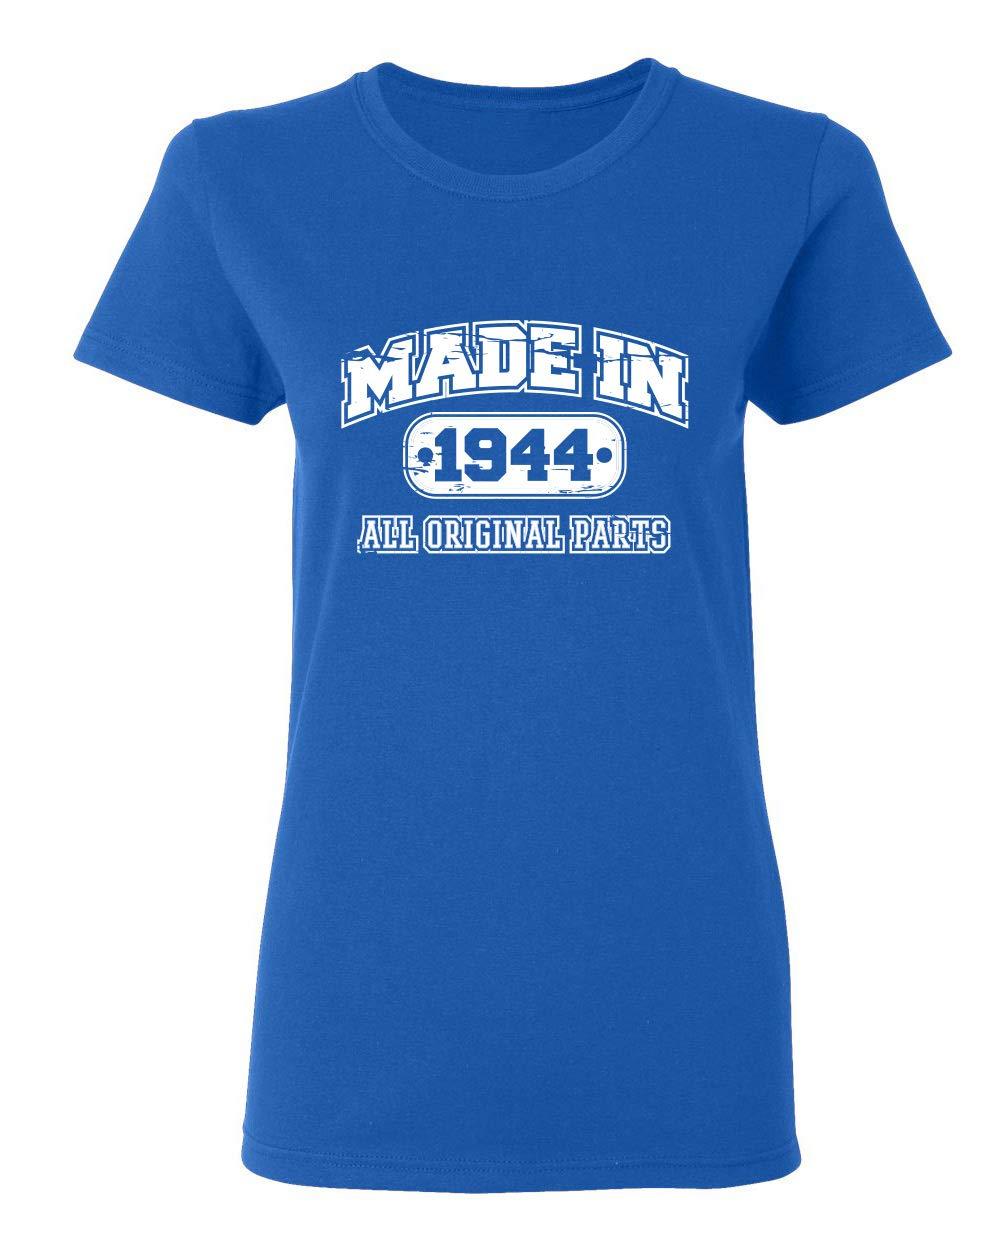 75th Birthday Sarcastic Graphic Novelty Funny T Shirt Royal 2306